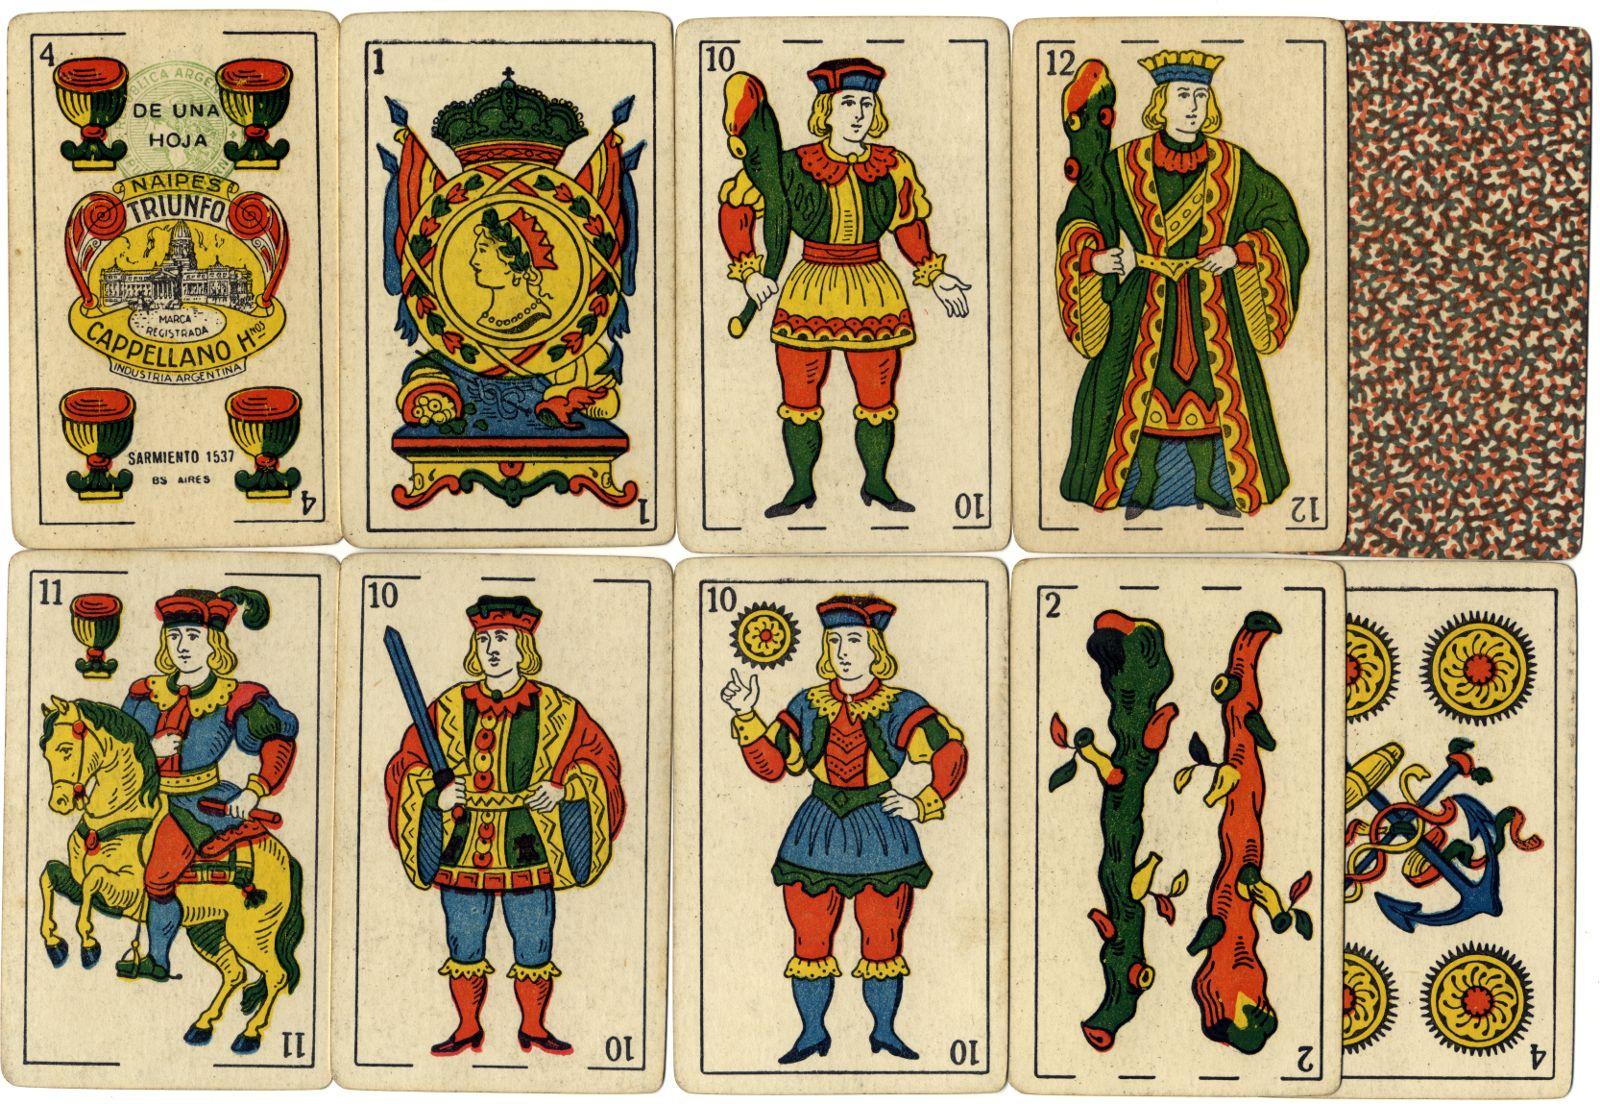 Naipes Triunfo, c.1930-40